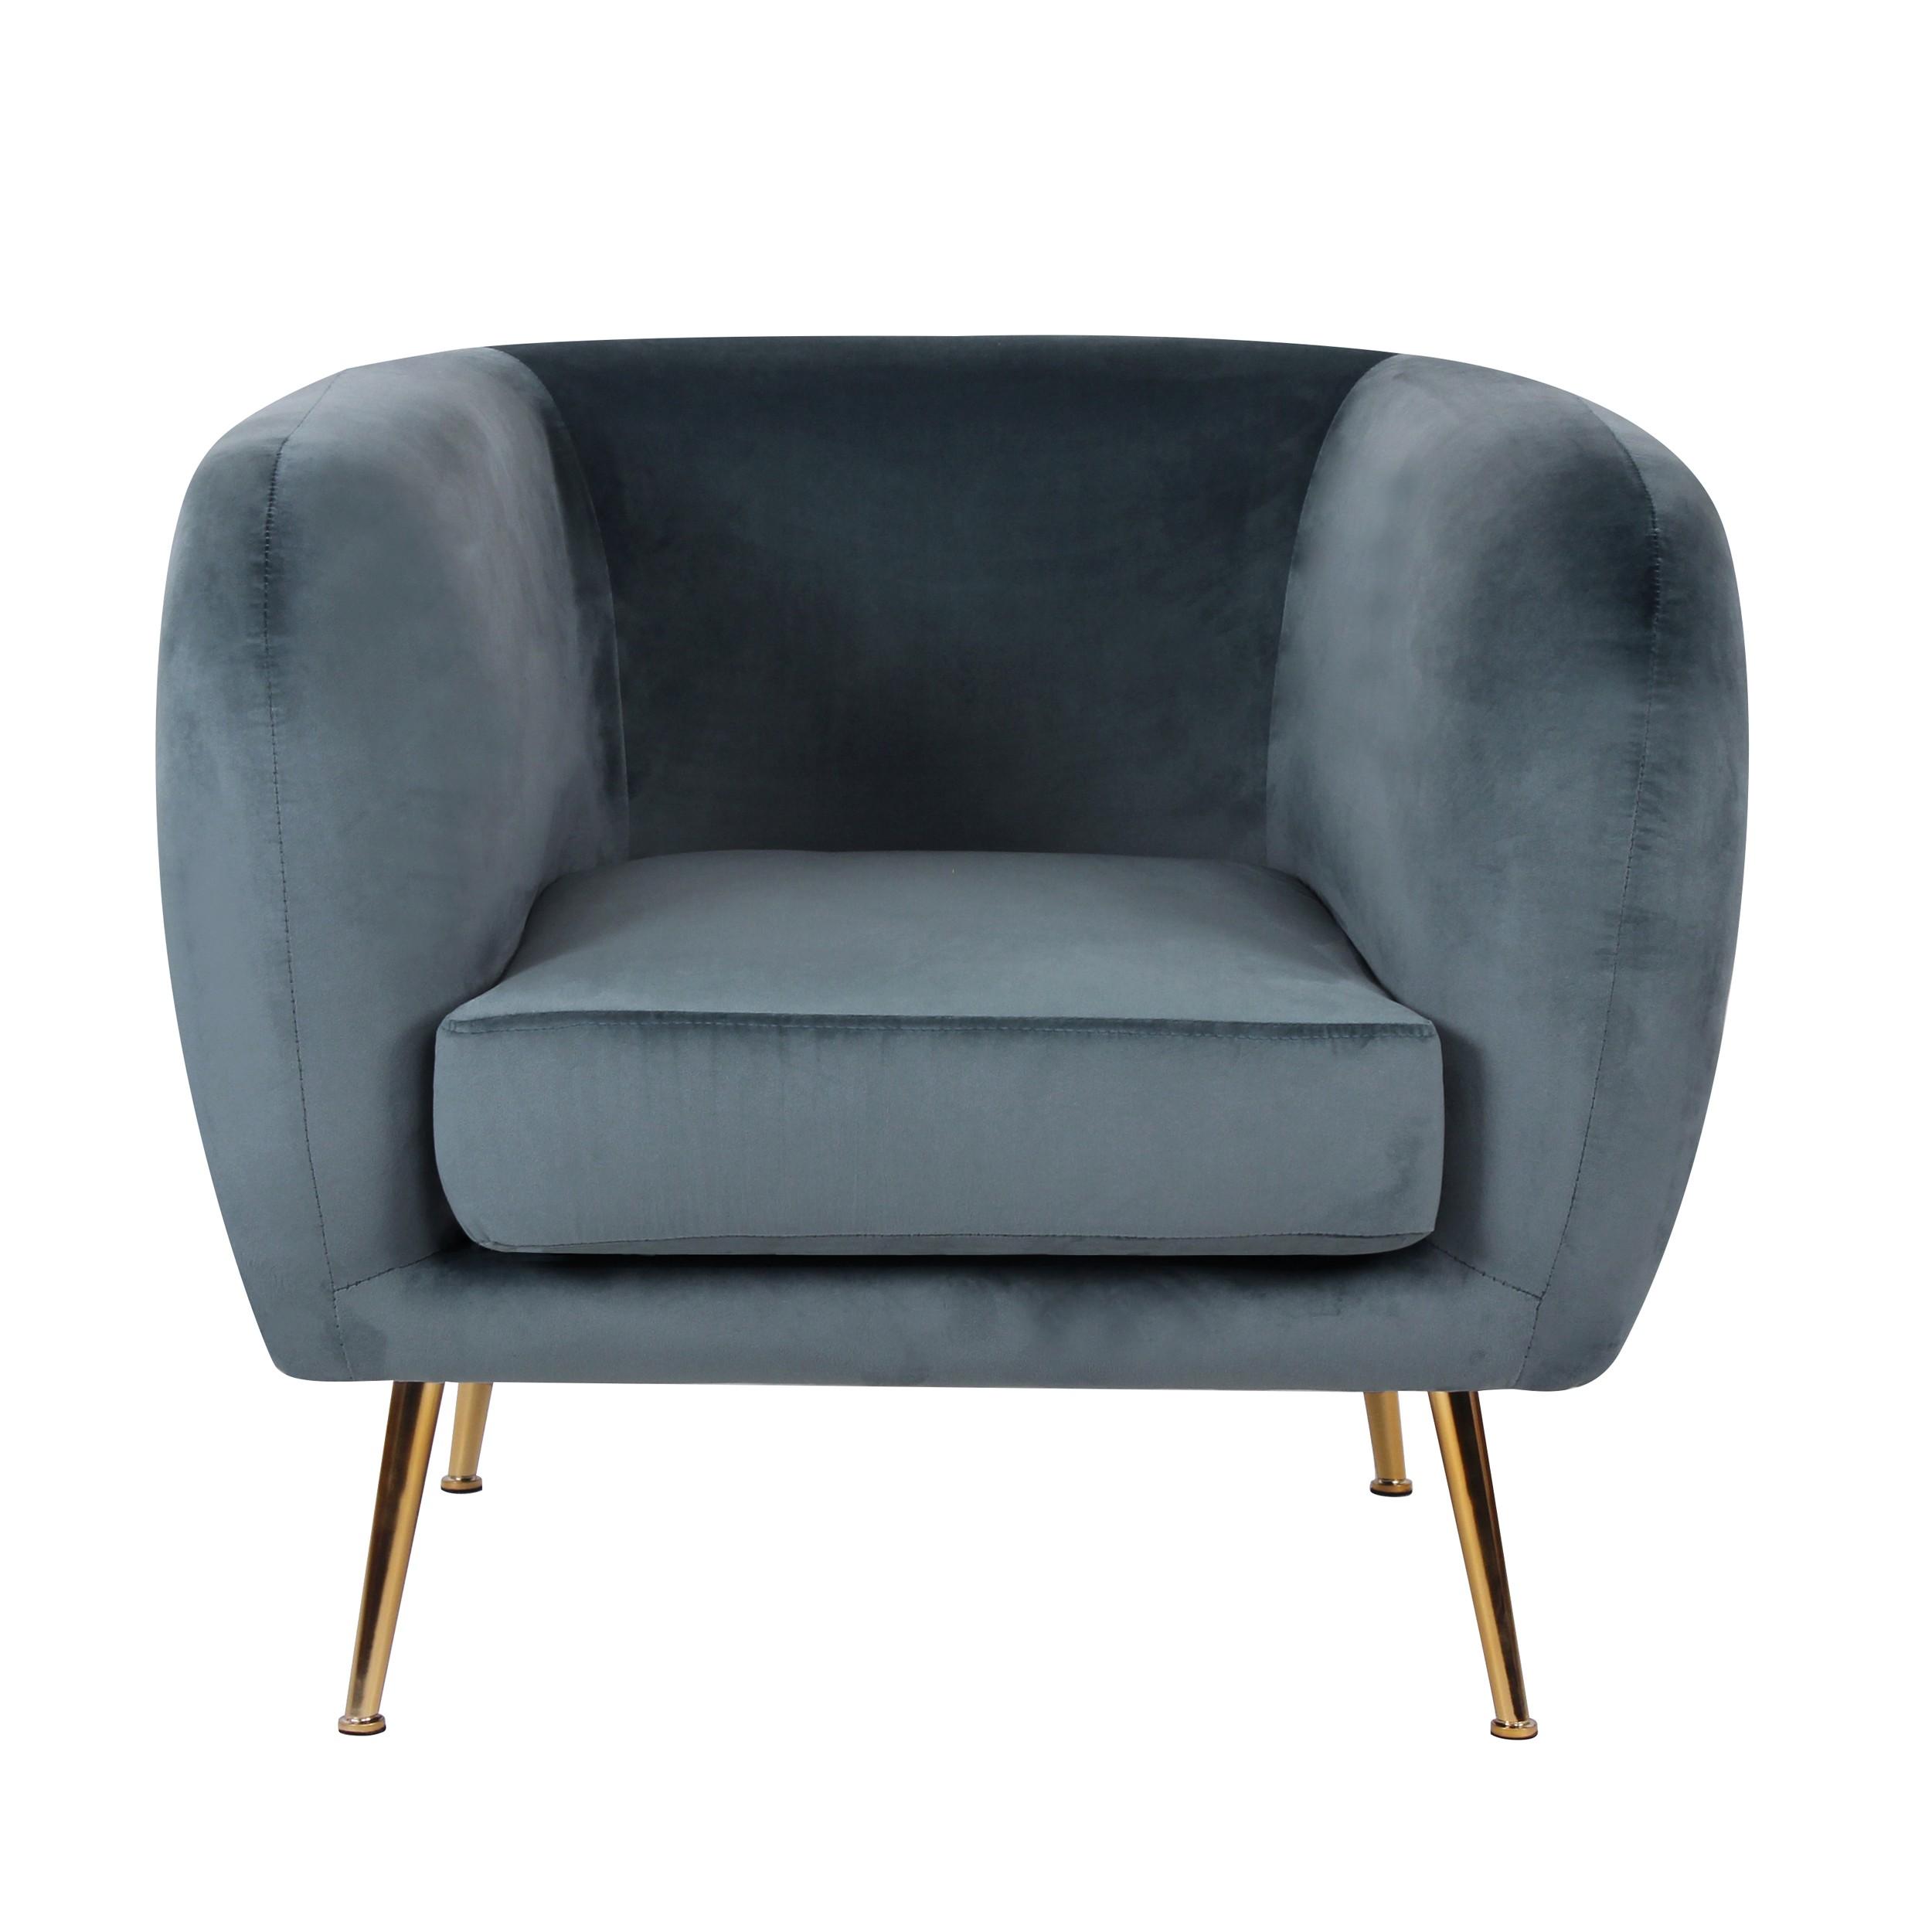 acheter fauteuil bleu en velours pieds metal dore